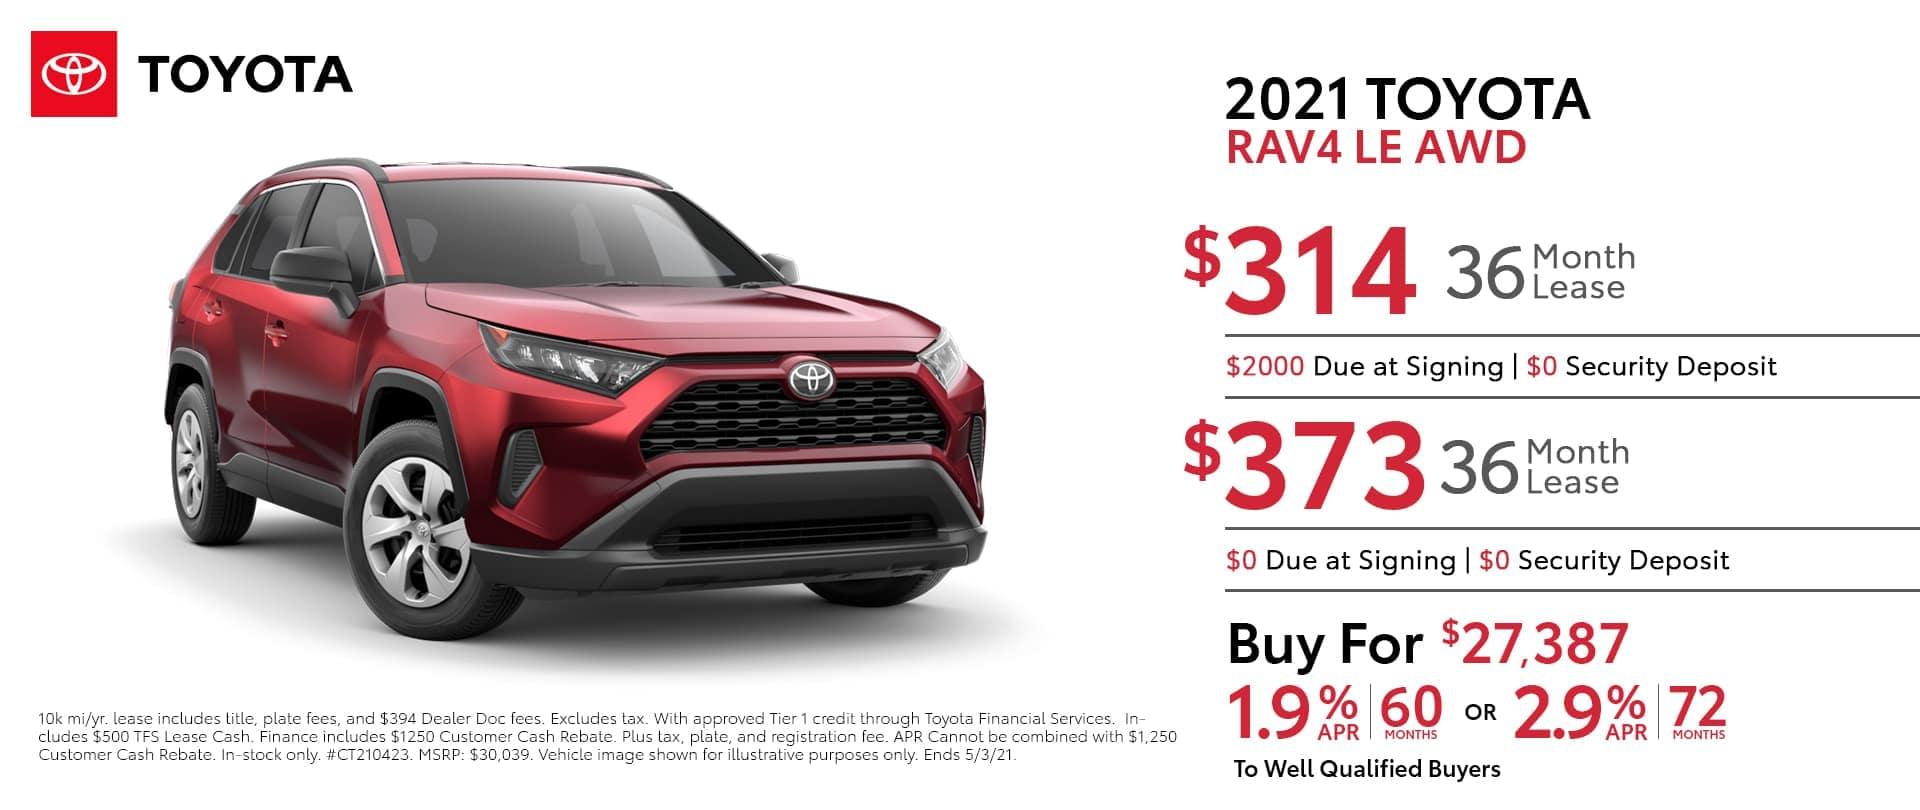 2021-Toyota-Rav4-LE-AWD